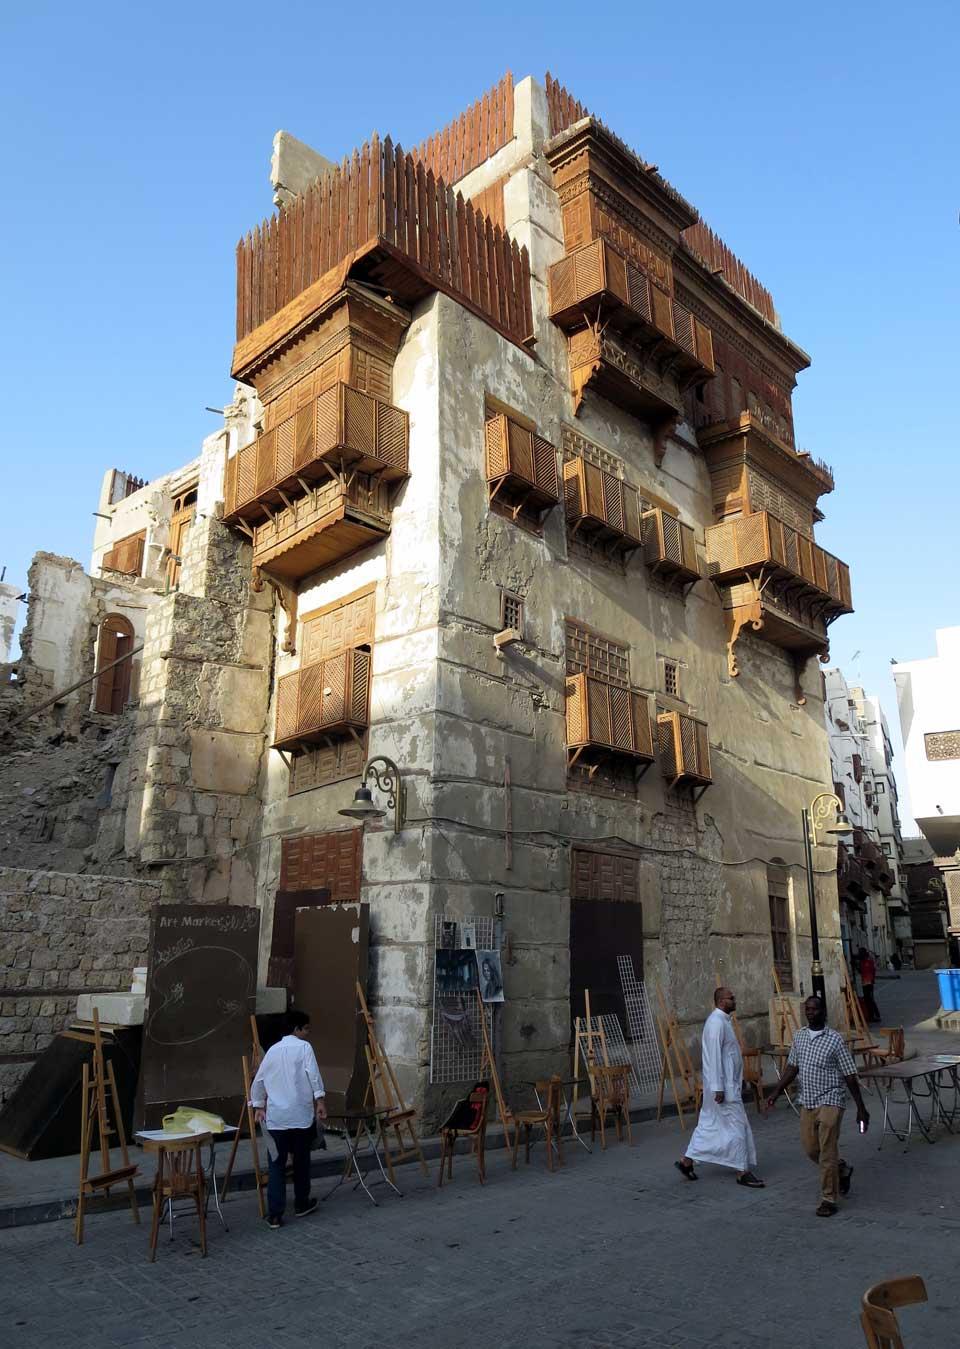 A typical Al-Balad house. © Mark Lowey